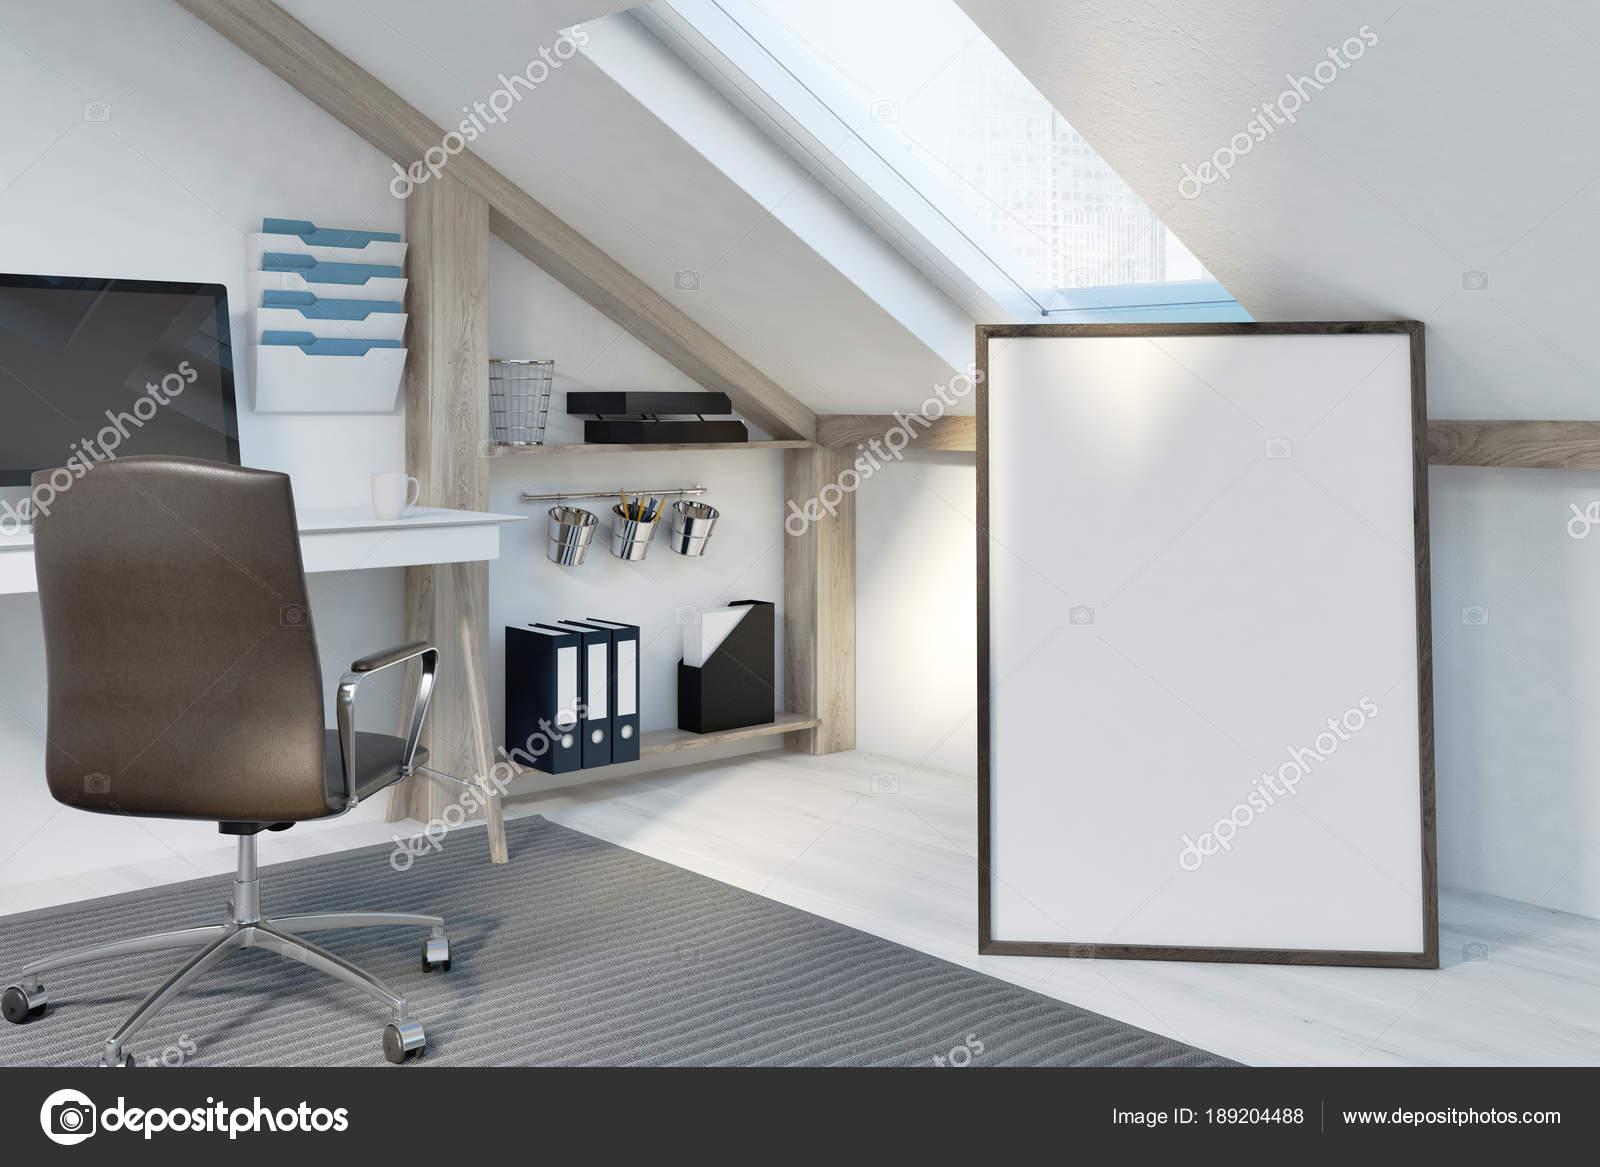 Poster in an attic home office — Stock Photo © denisismagilov #189204488